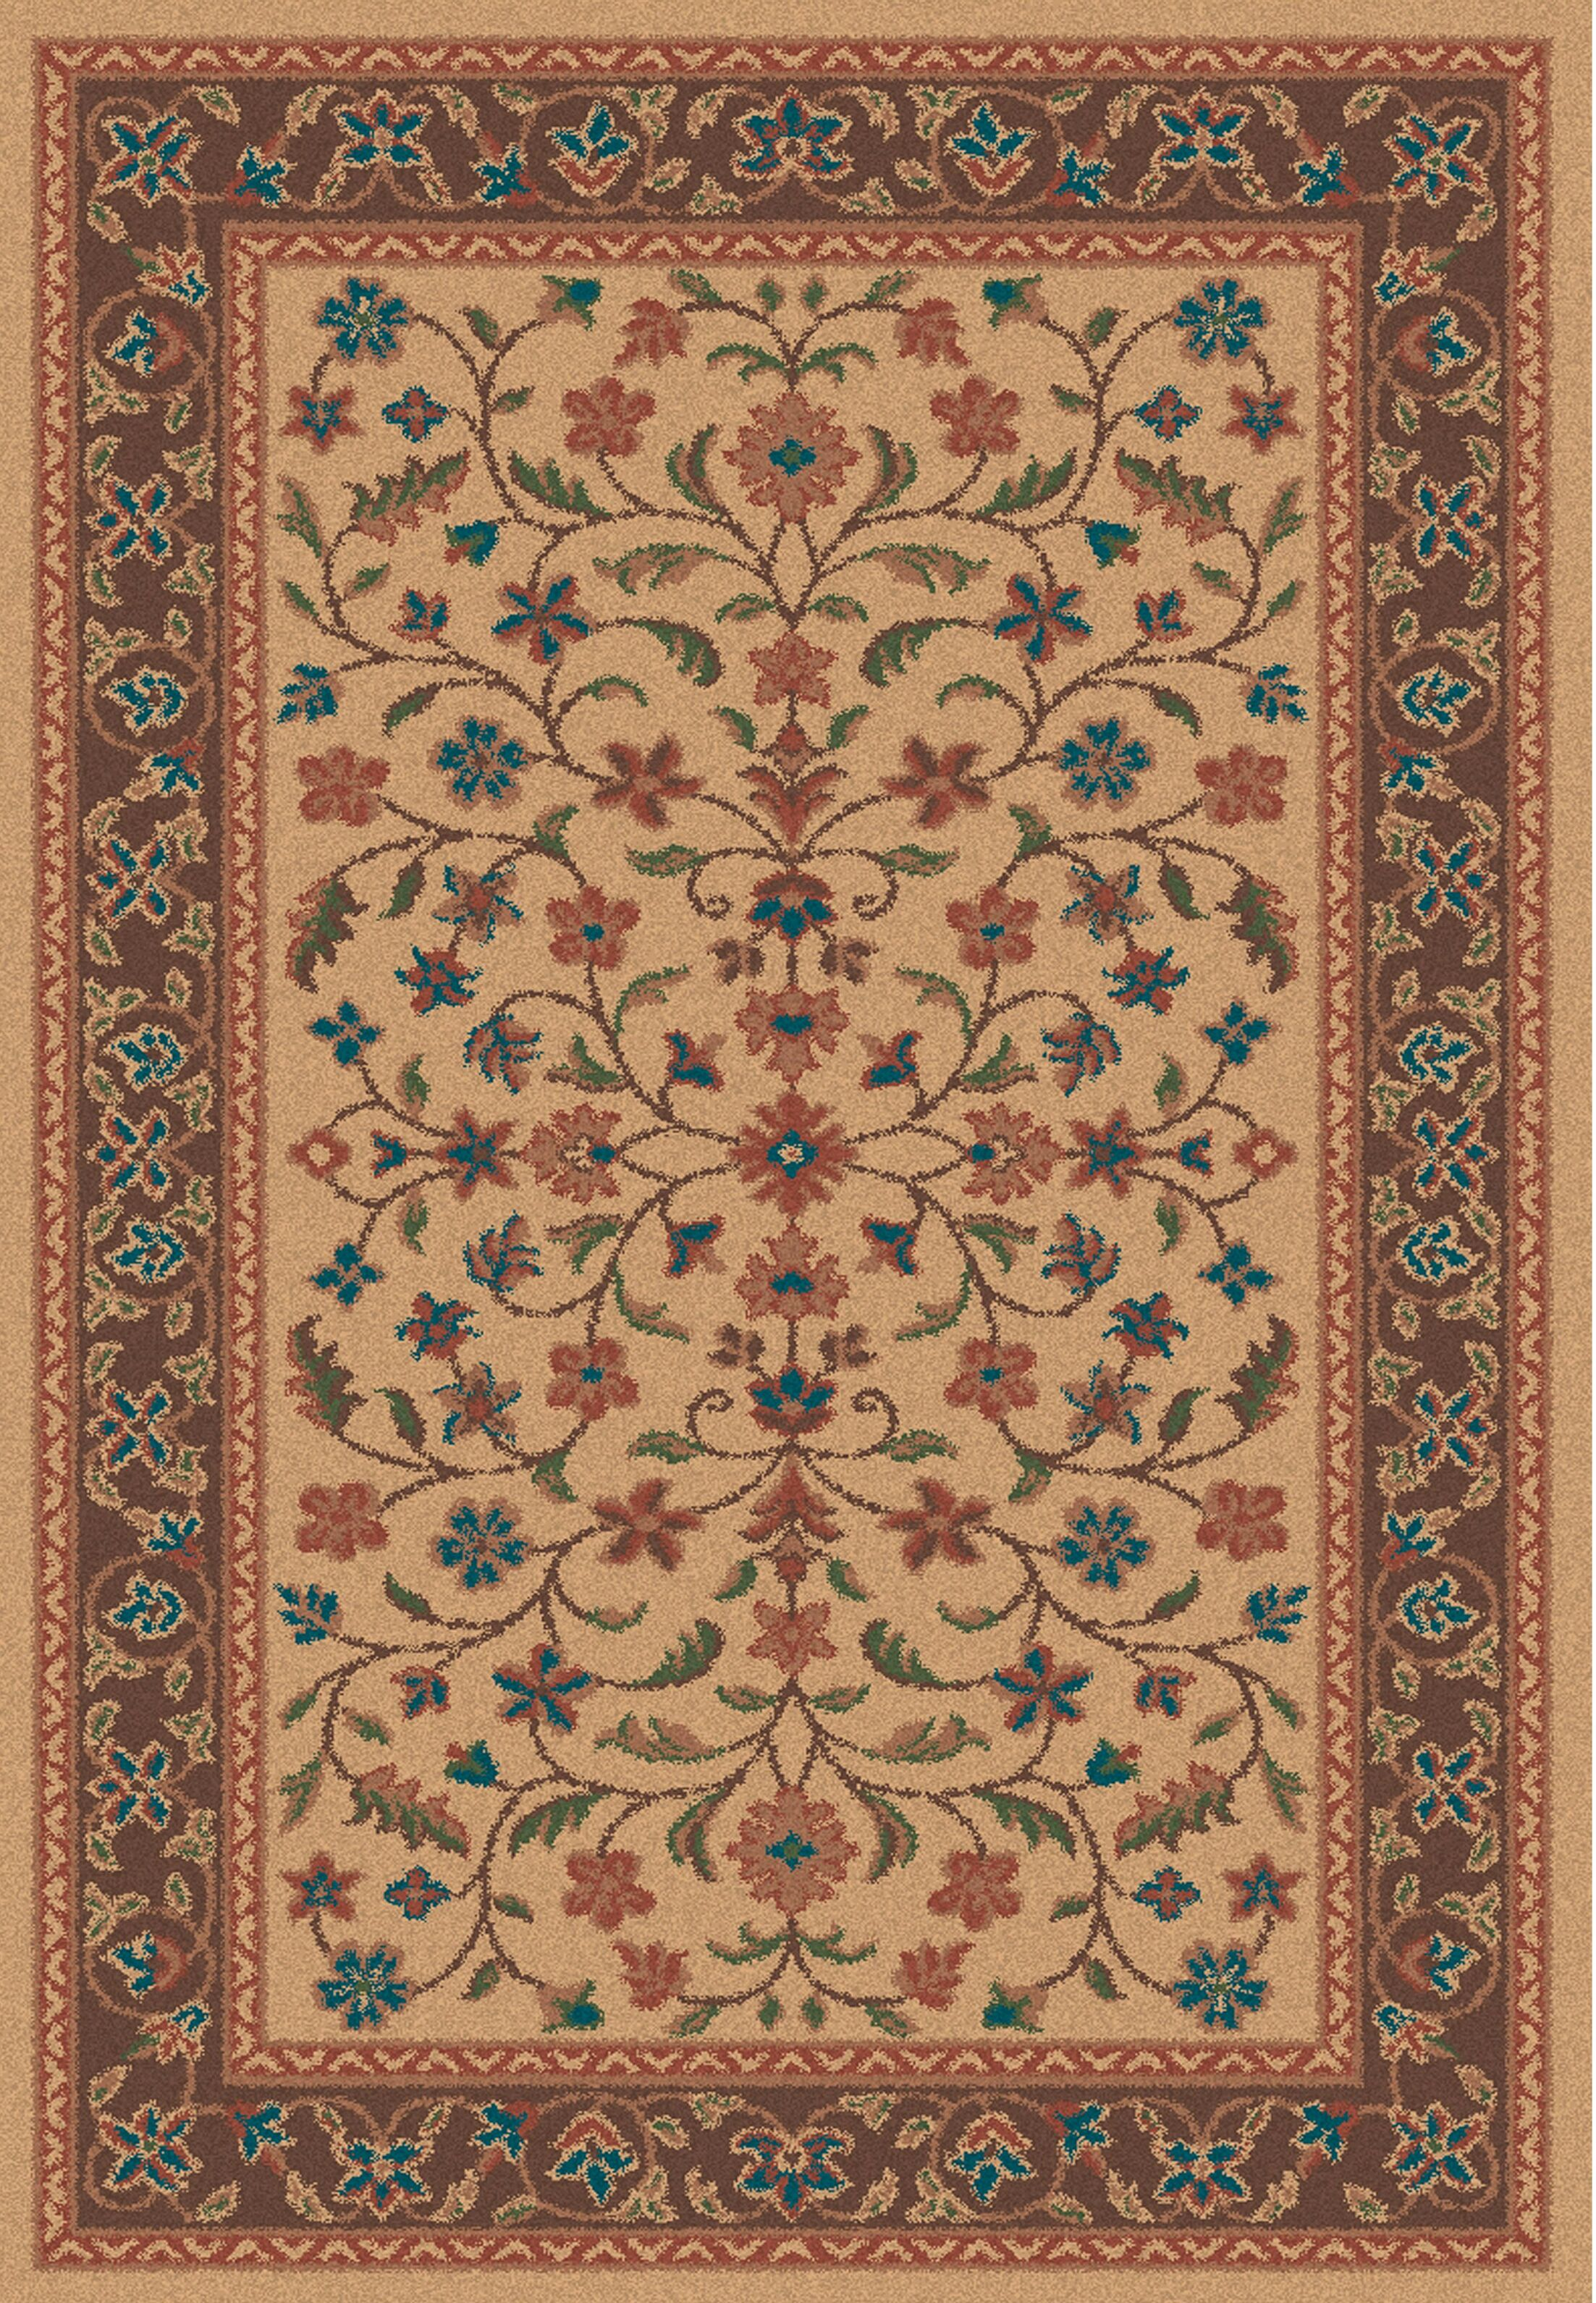 Wellington Isfahan Stone Rug Rug Size: 5' x 7'